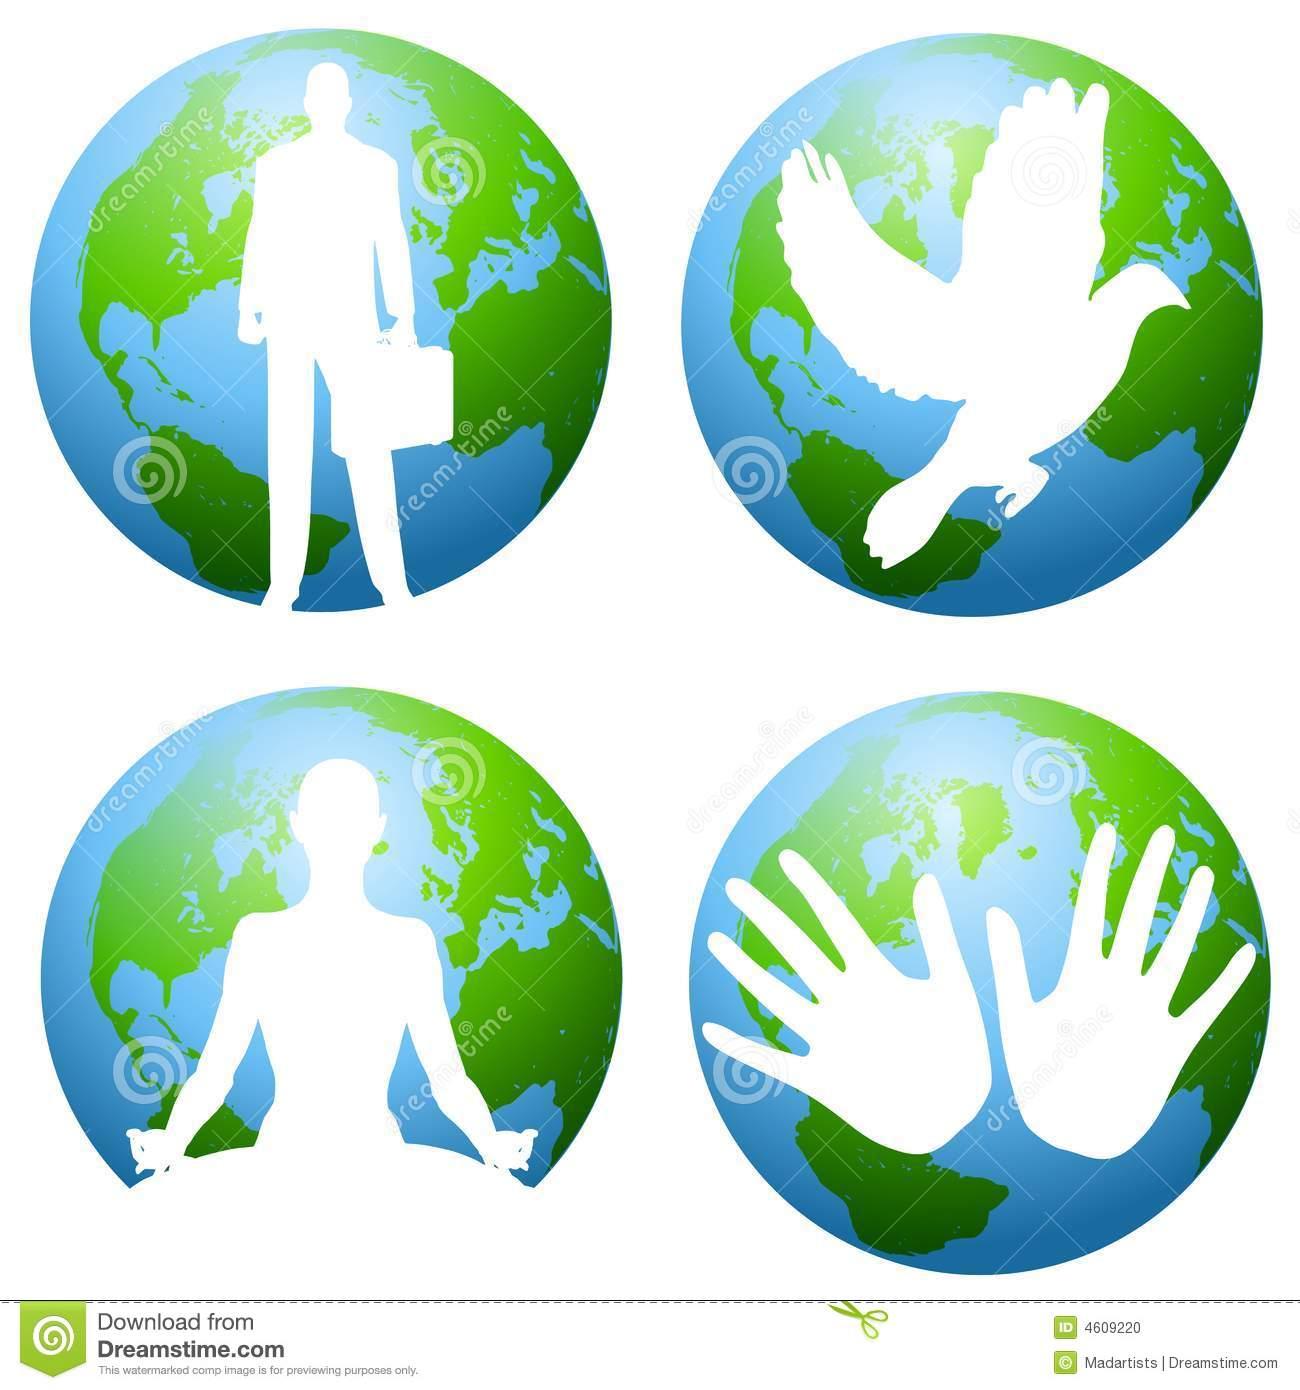 Earth and Environmental Clip Art